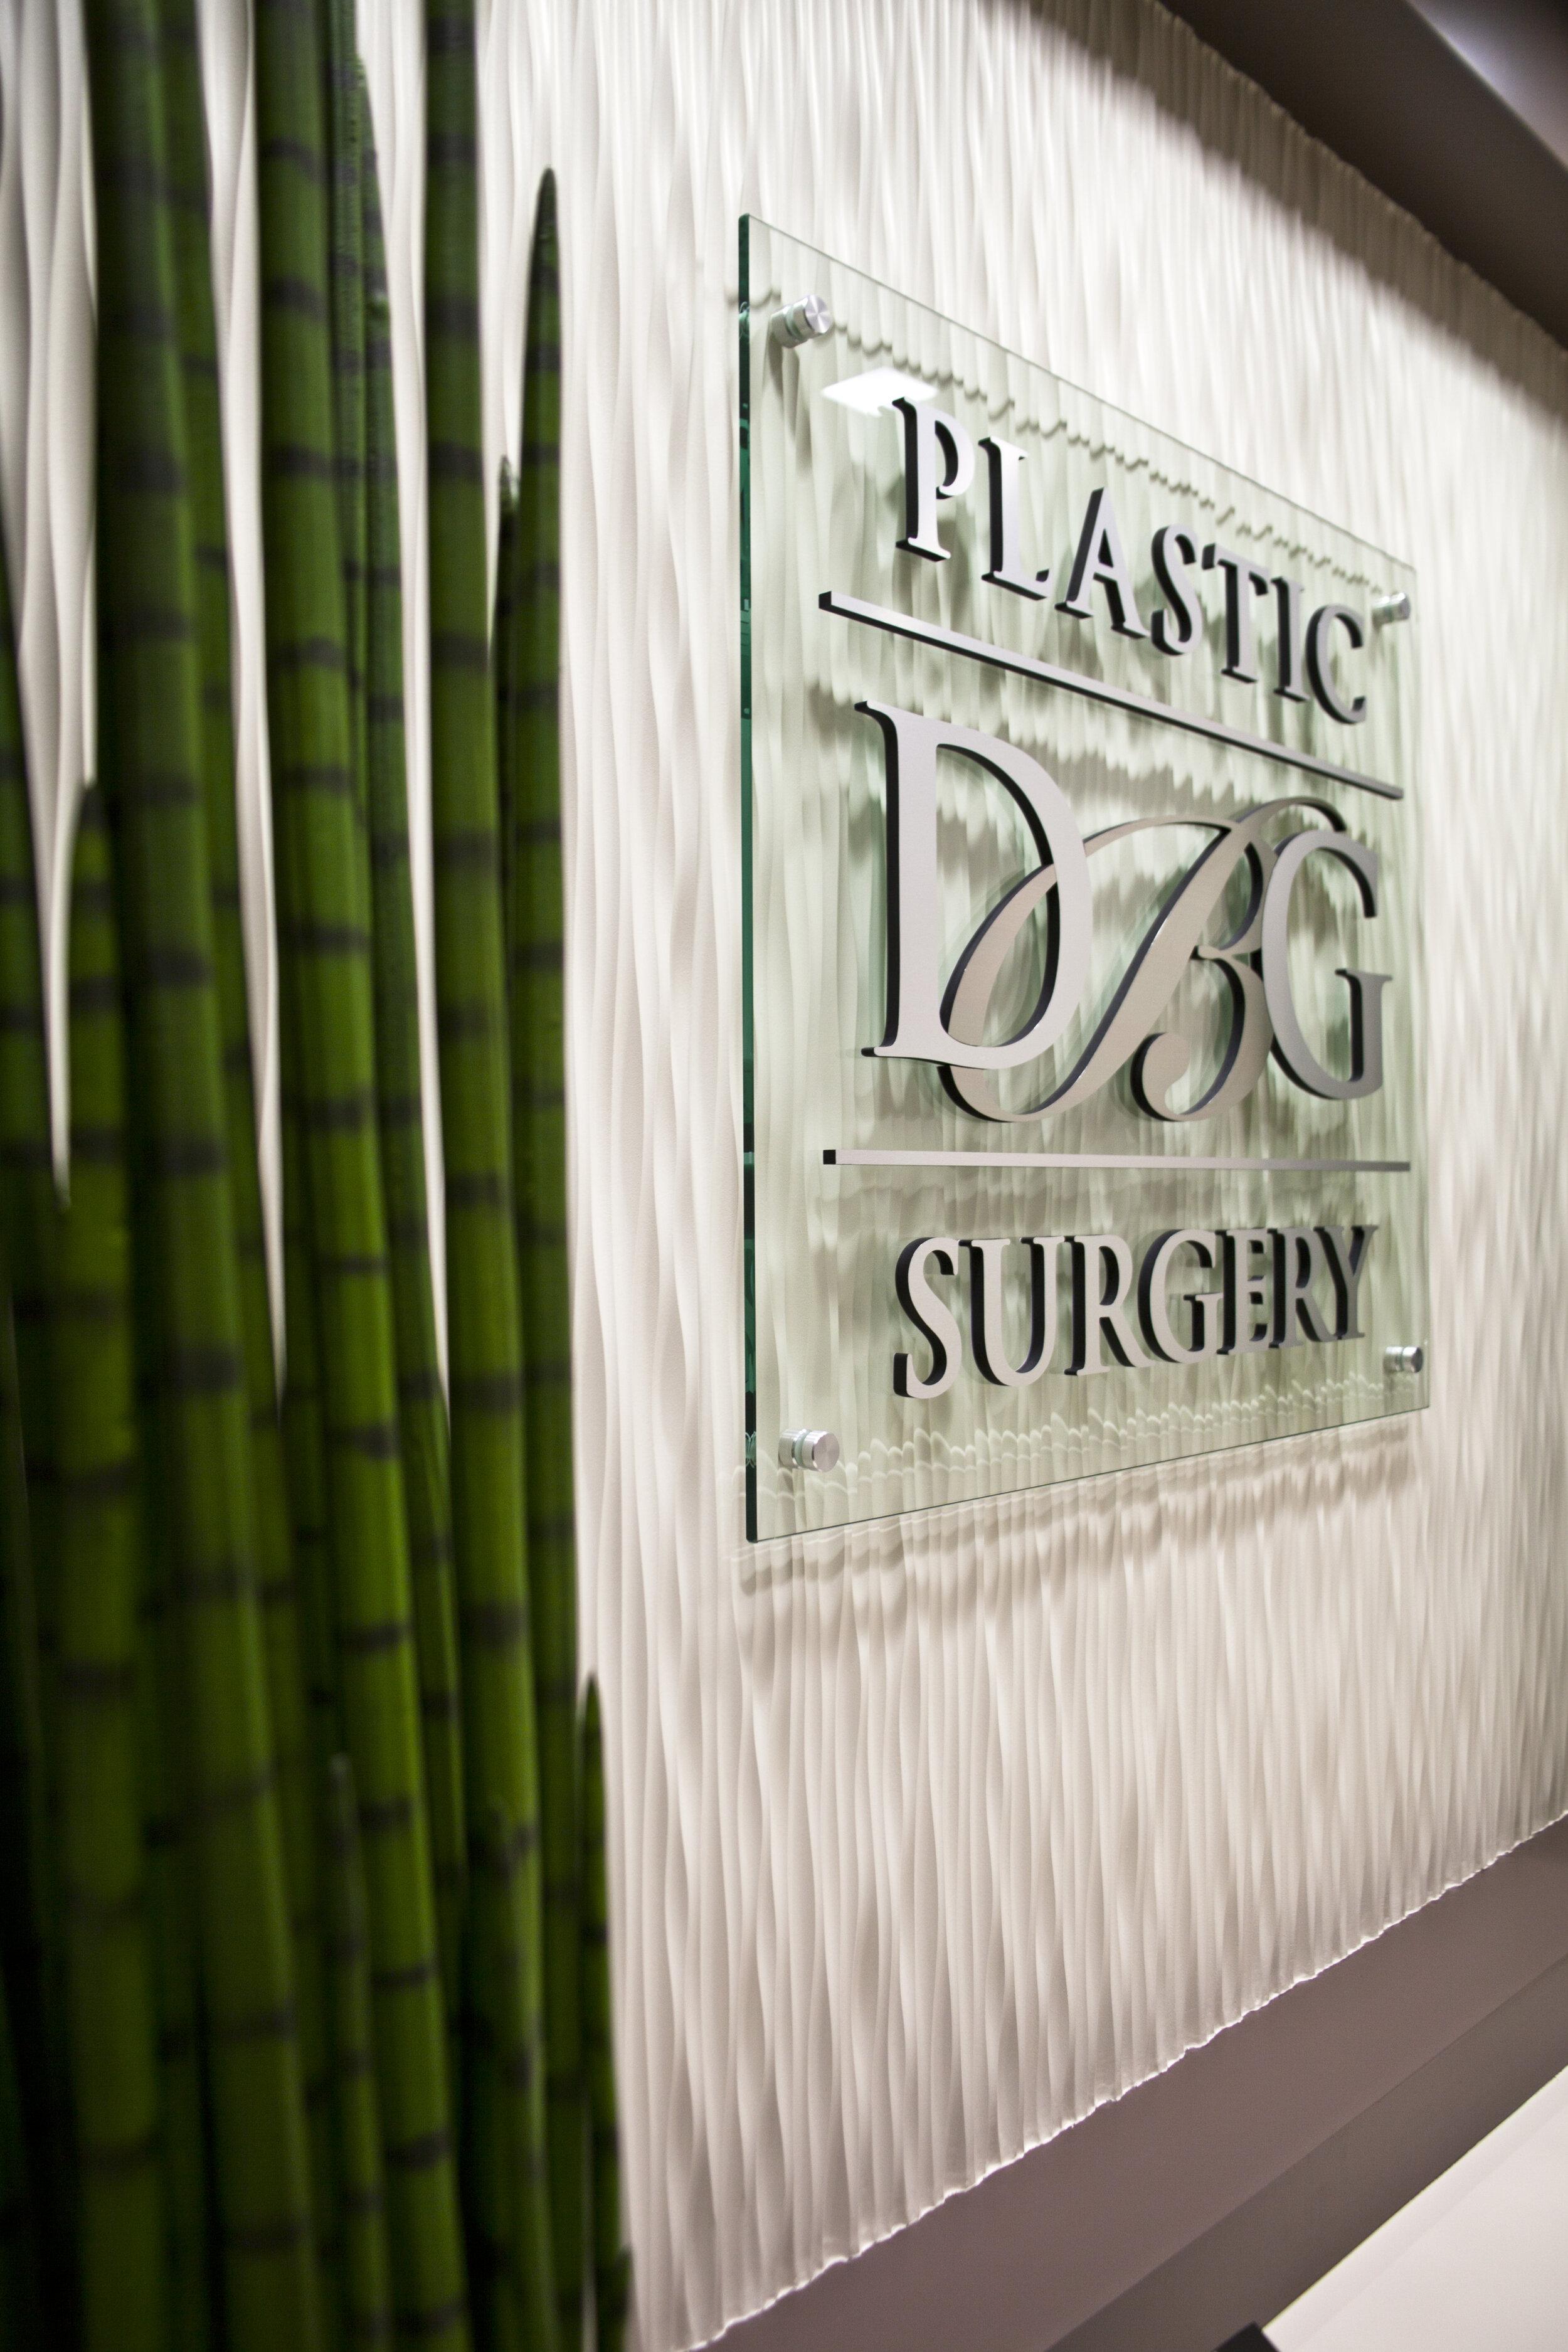 DBG Plastic Surgery